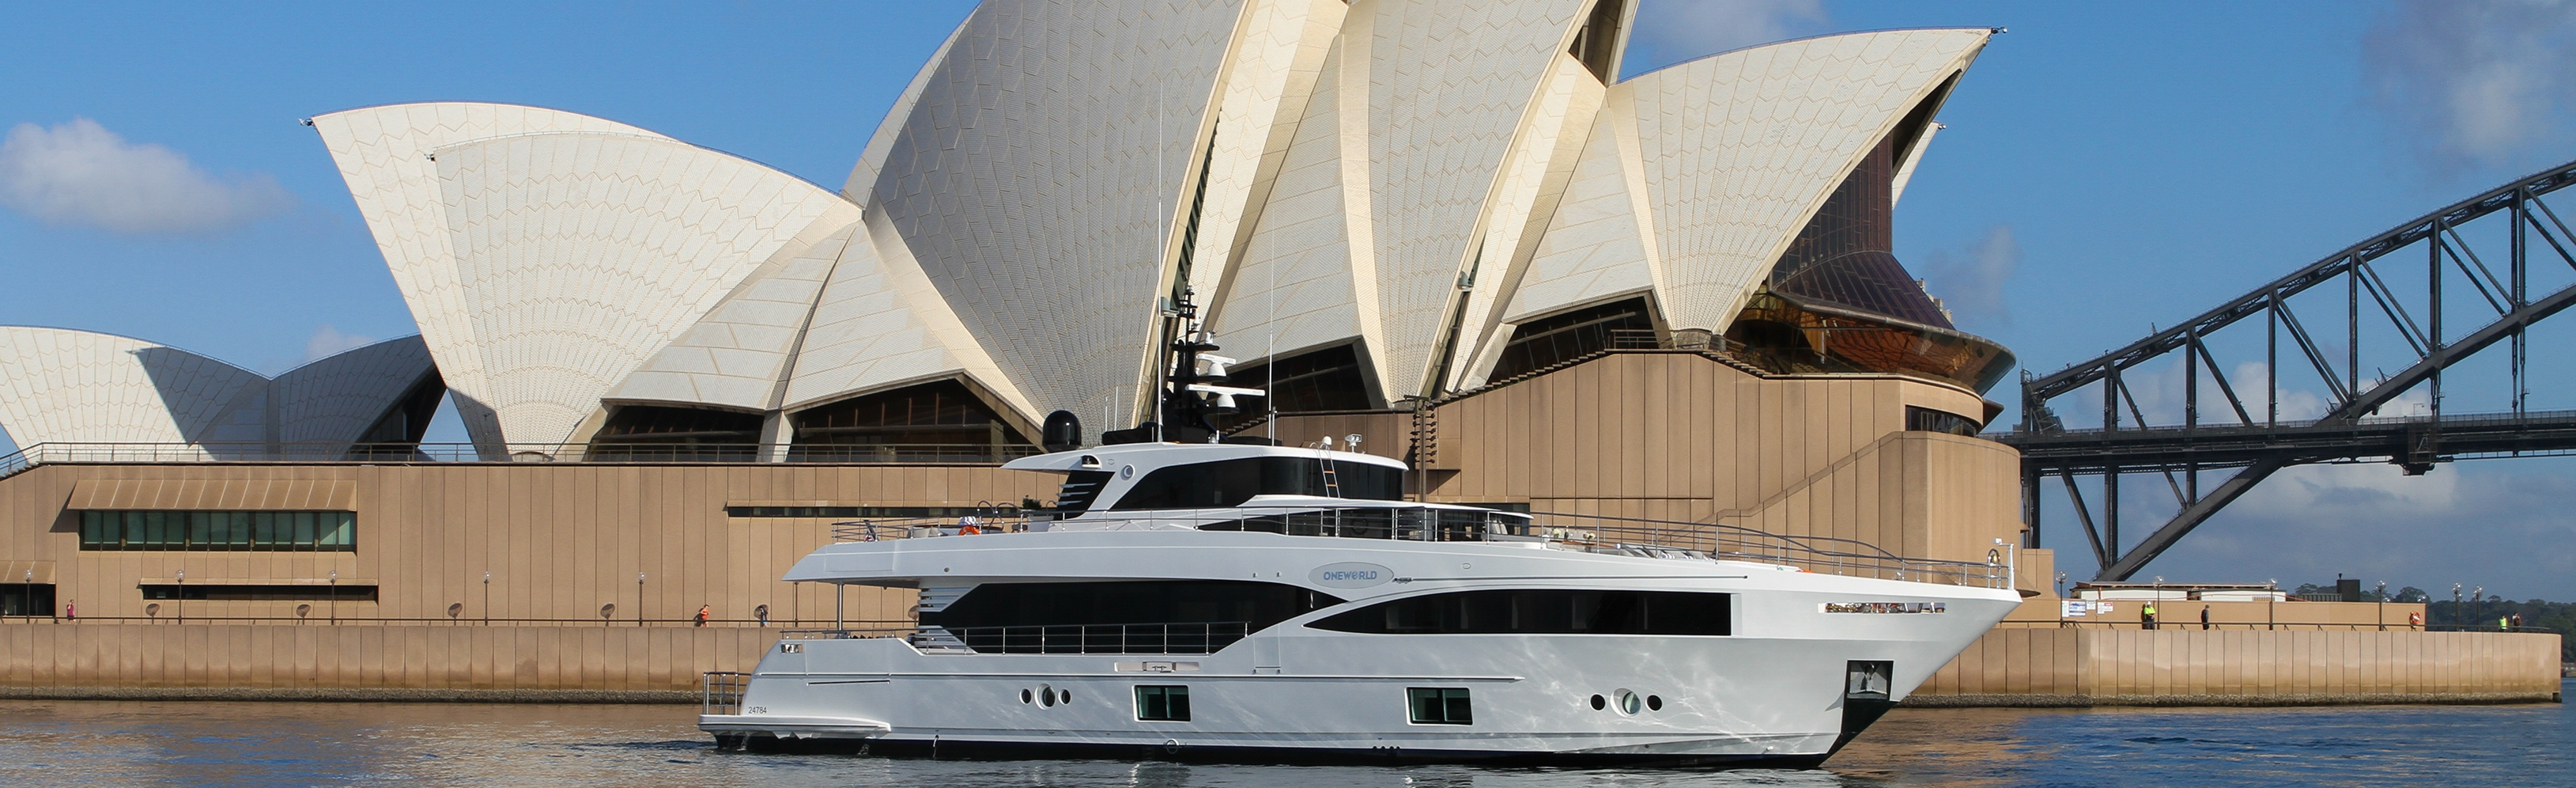 Majesty-100-Oneworld,-Australia